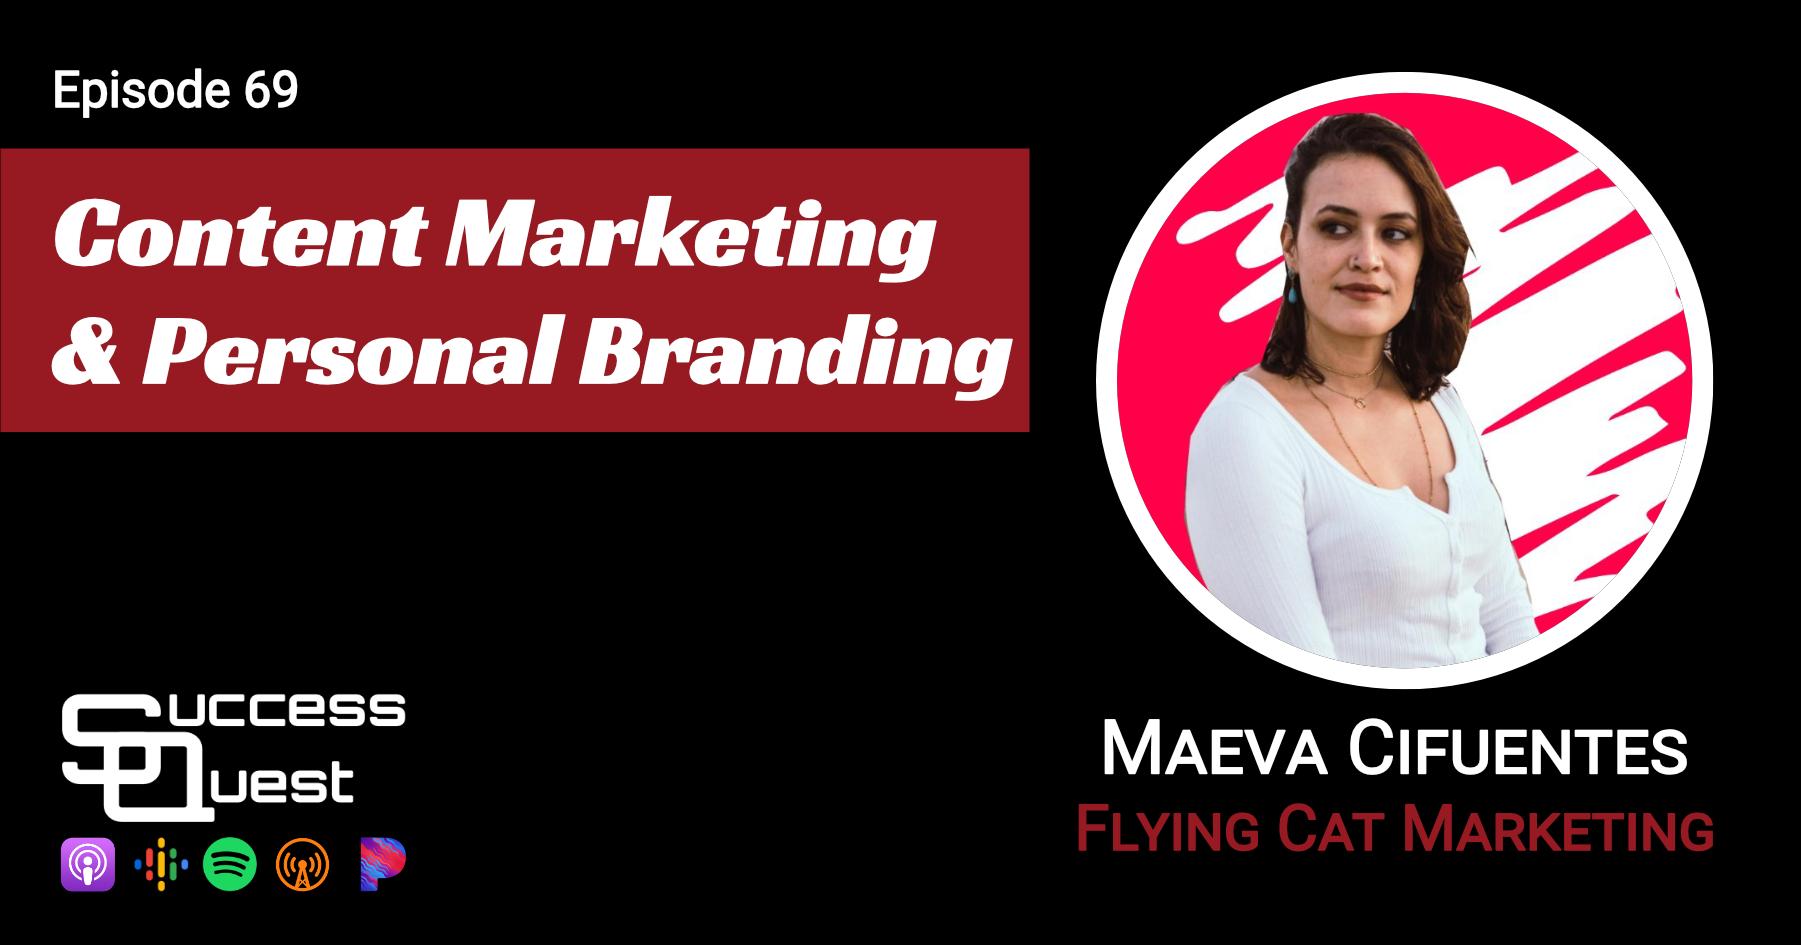 Content Marketing and Personal Branding SuccessQuest Episode 69 Maeva Cifuentes